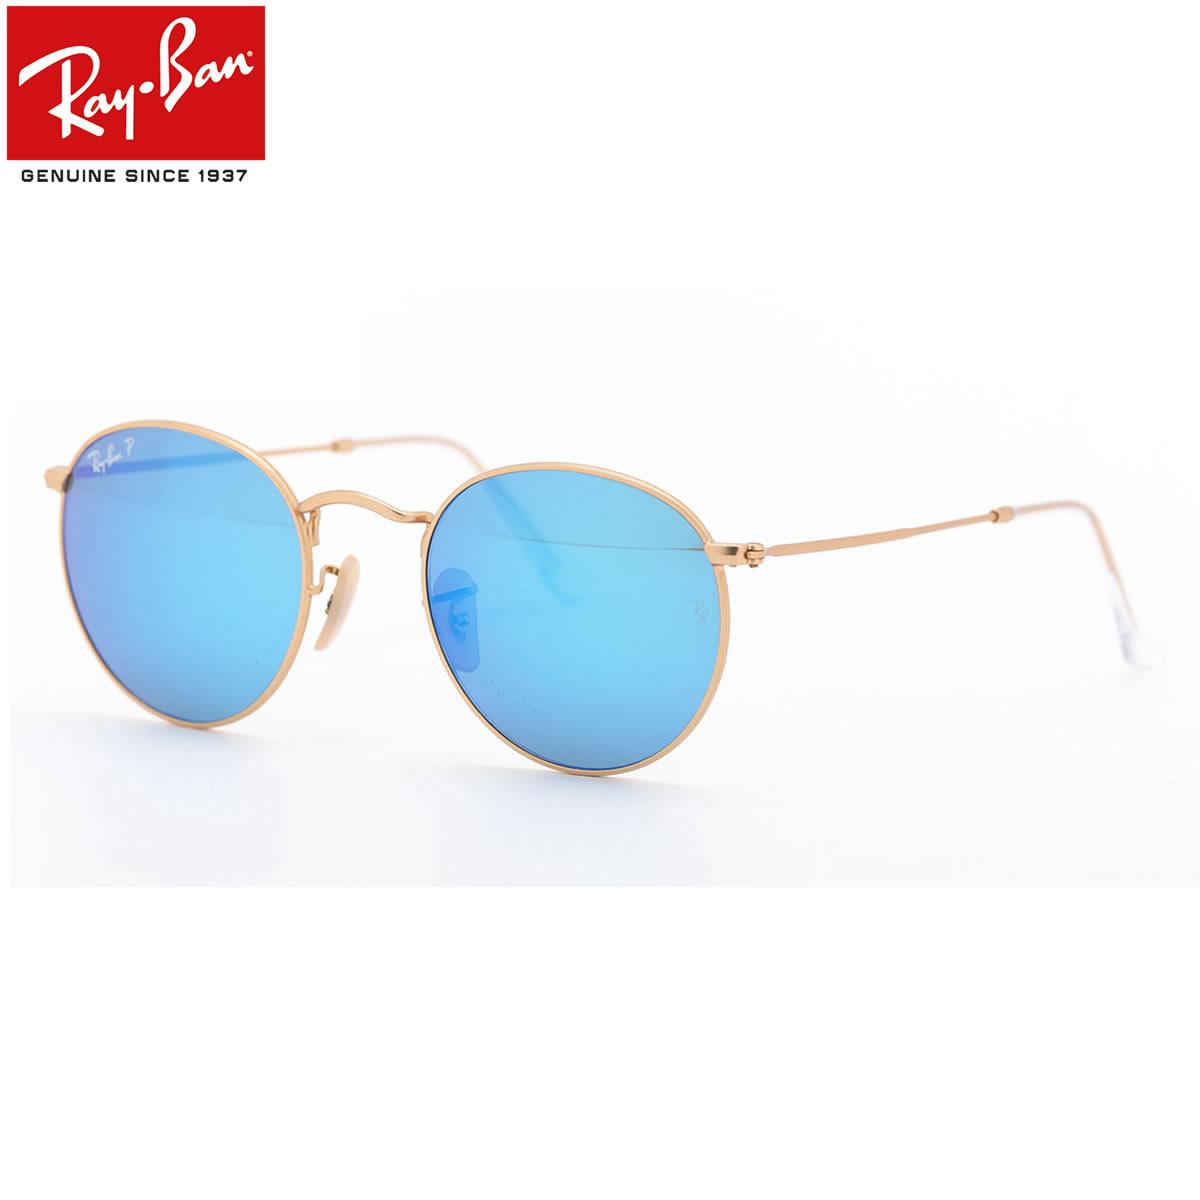 ray ban blue lens sunglasses